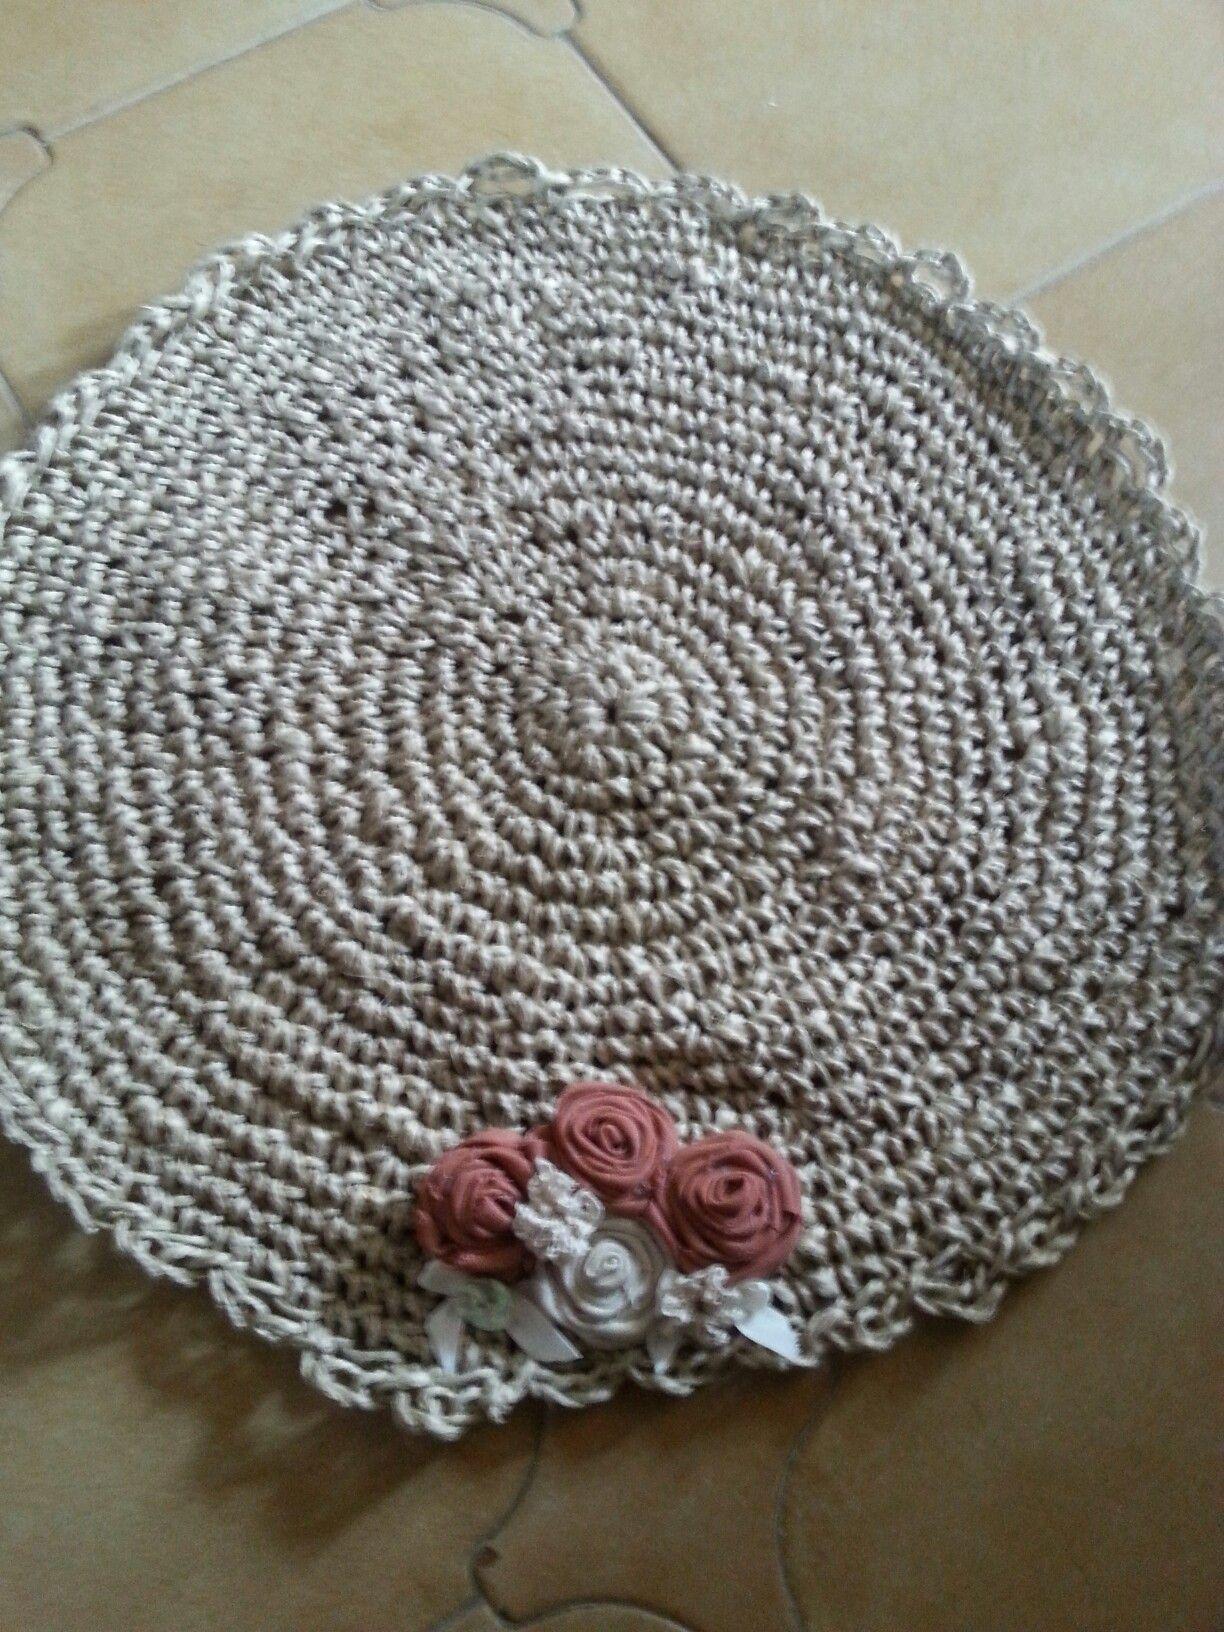 tappeto di corda | cotton candy heart | Pinterest